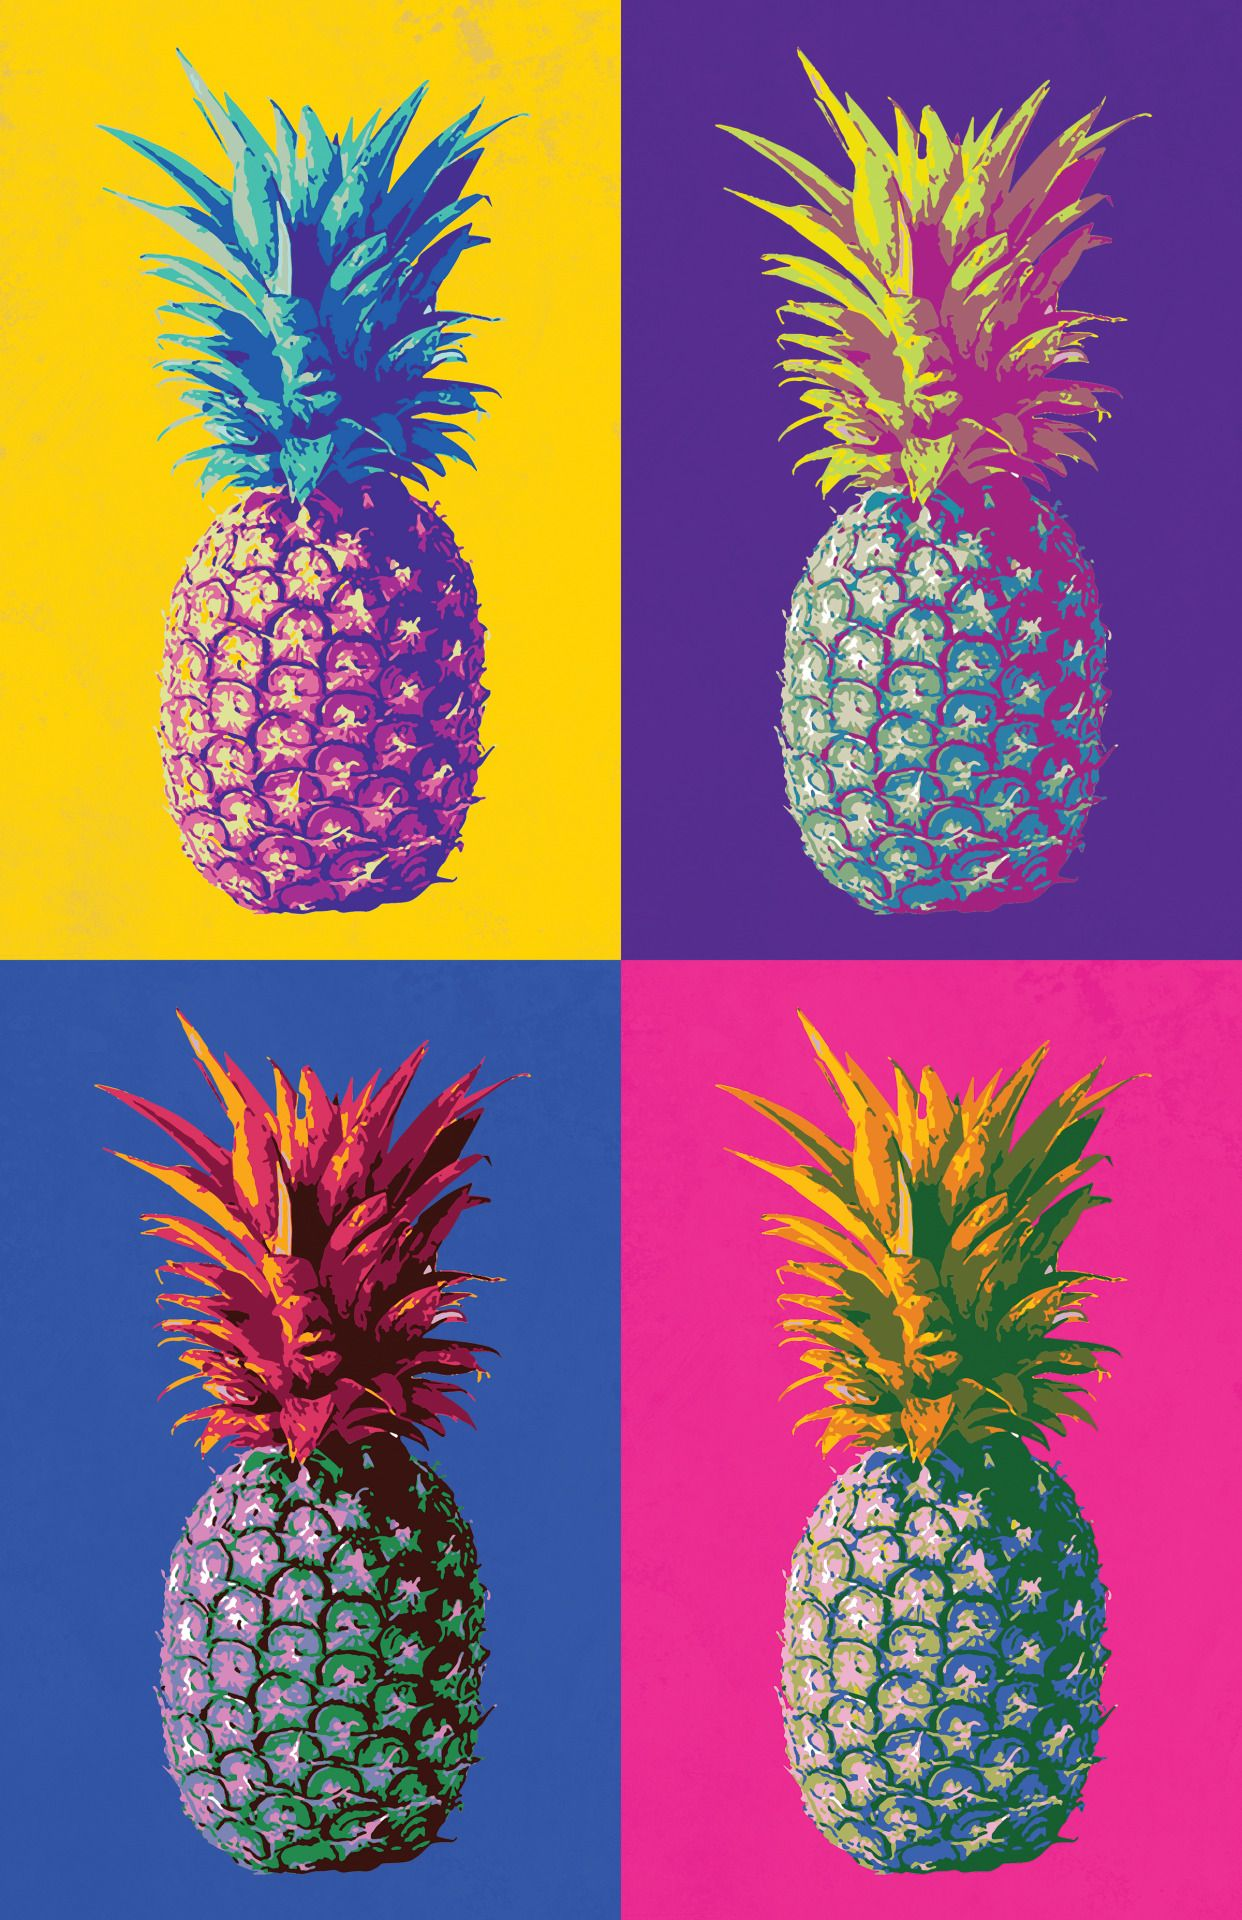 lynadesign Pop art decor, Andy warhol pop art, Warhol art